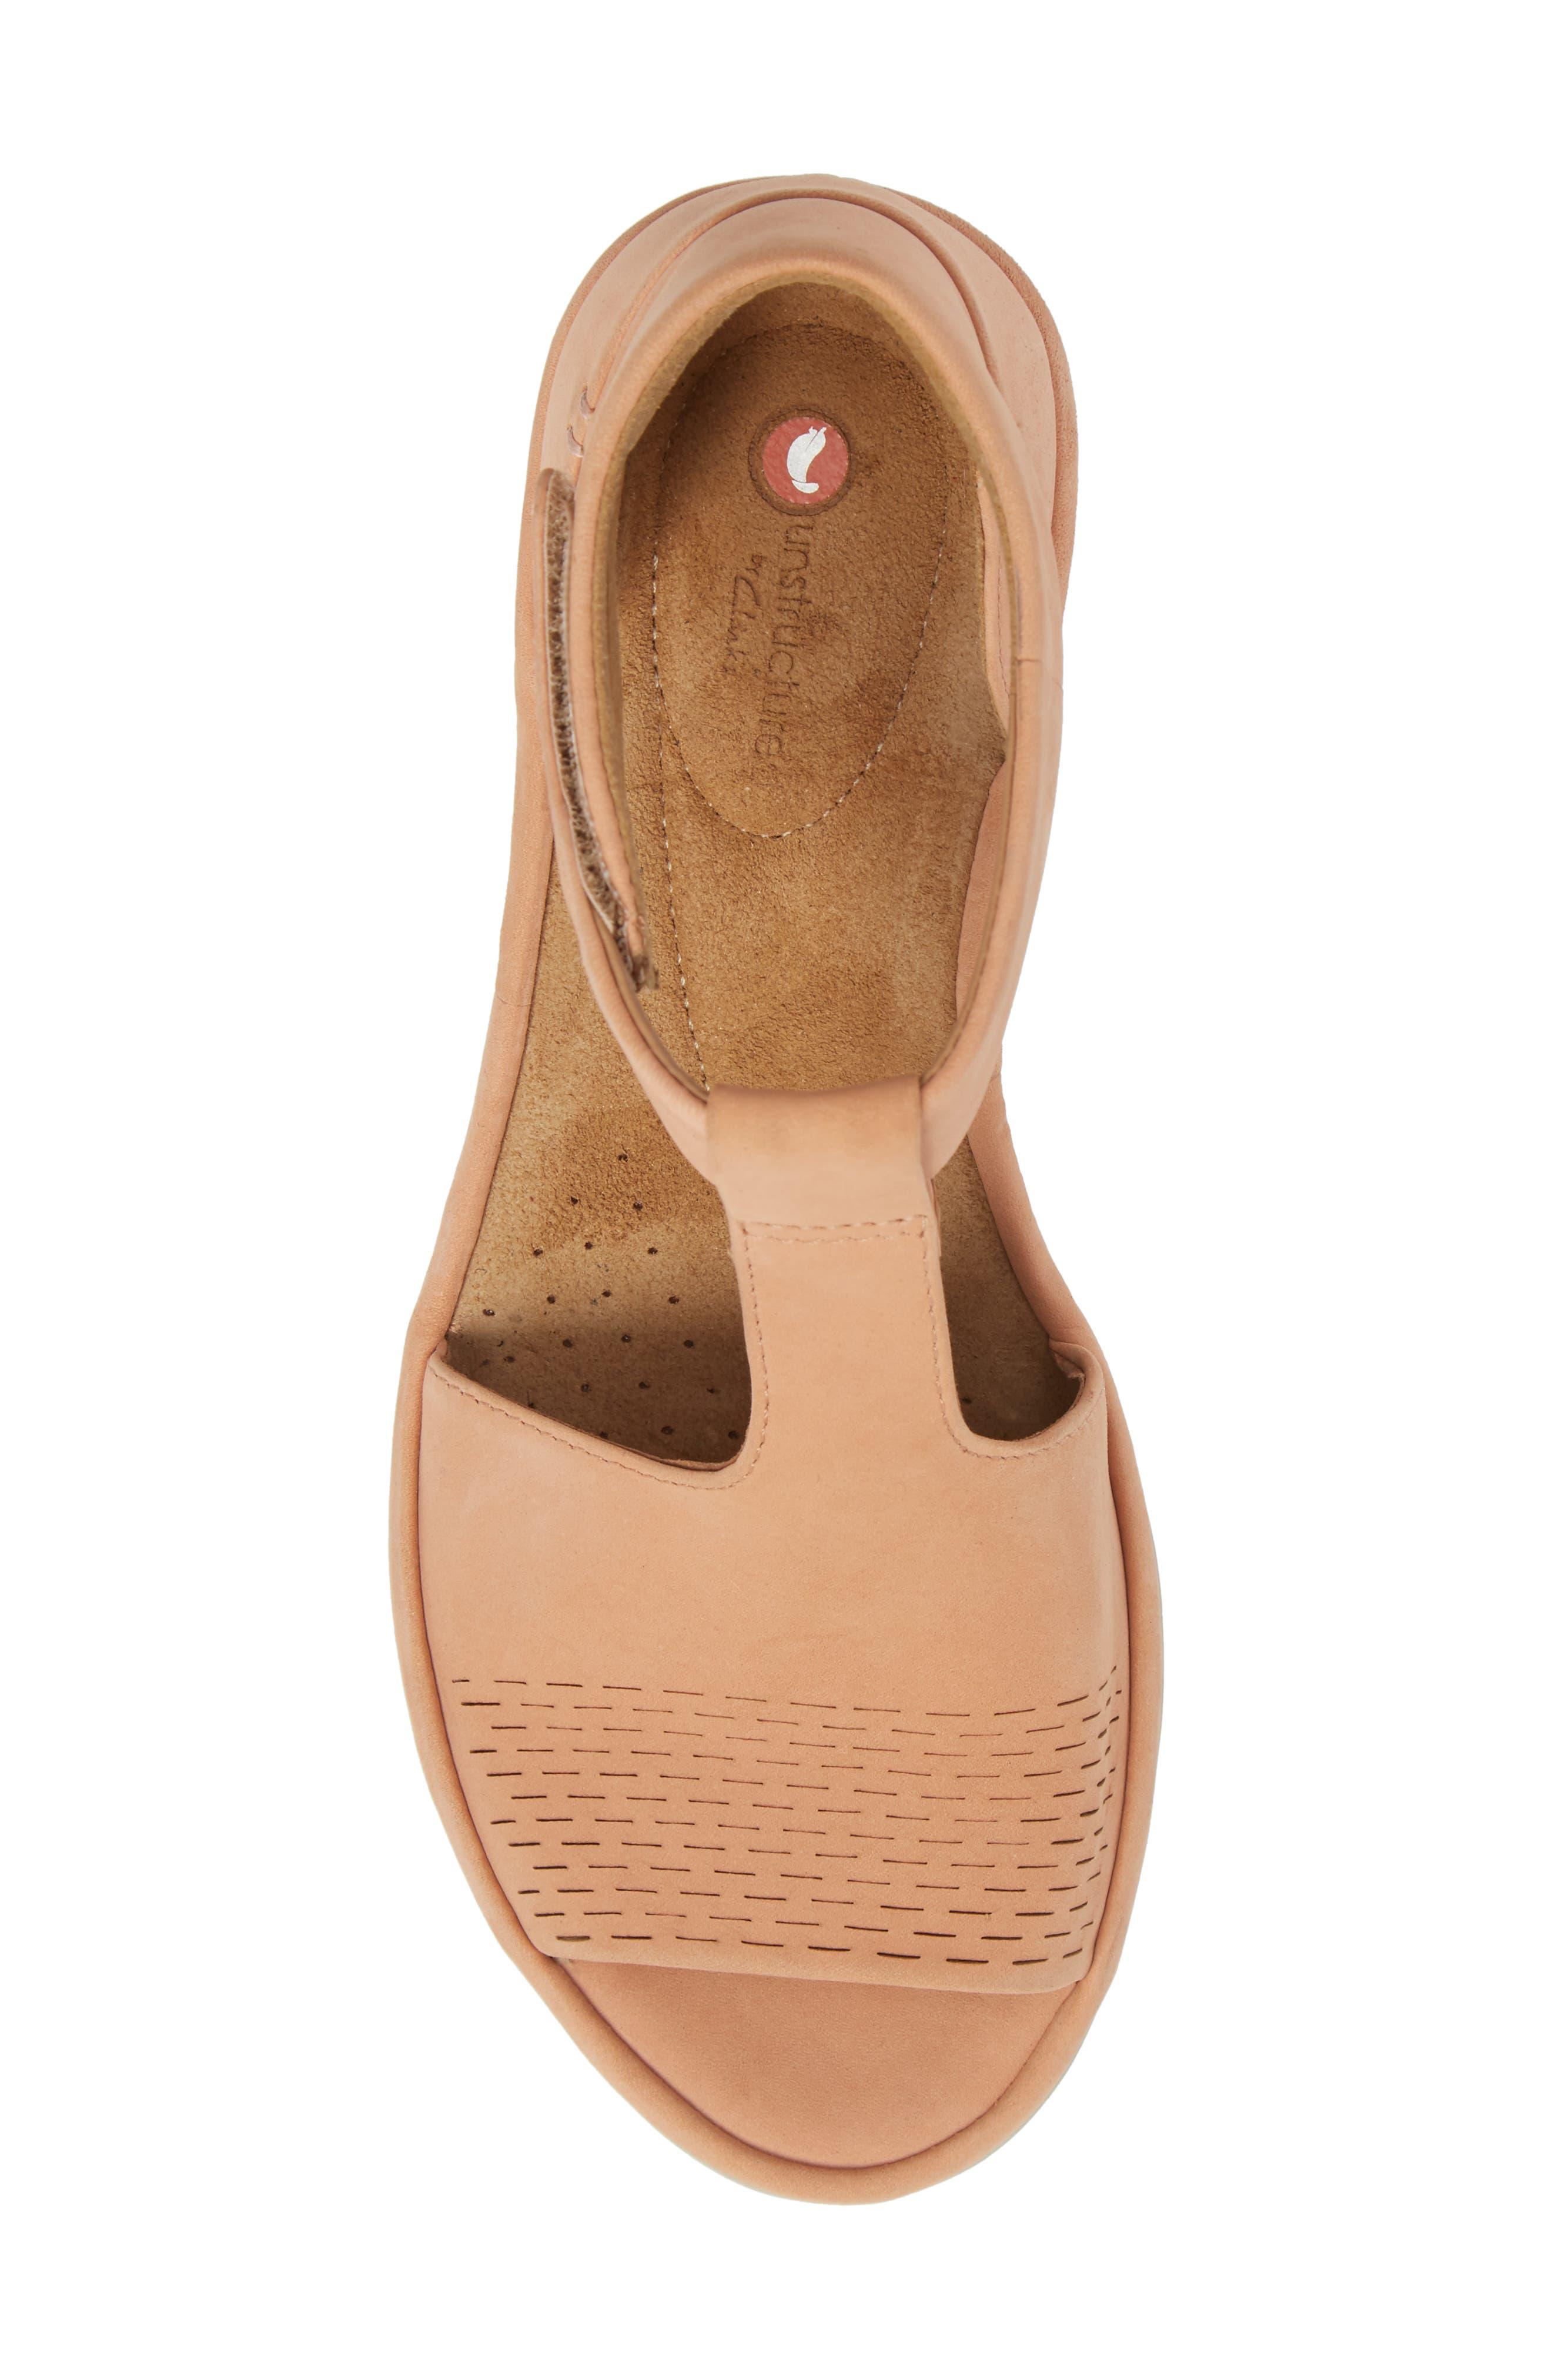 Wynnmere Avah T-Strap Wedge Sandal,                             Alternate thumbnail 5, color,                             Peach Nubuck